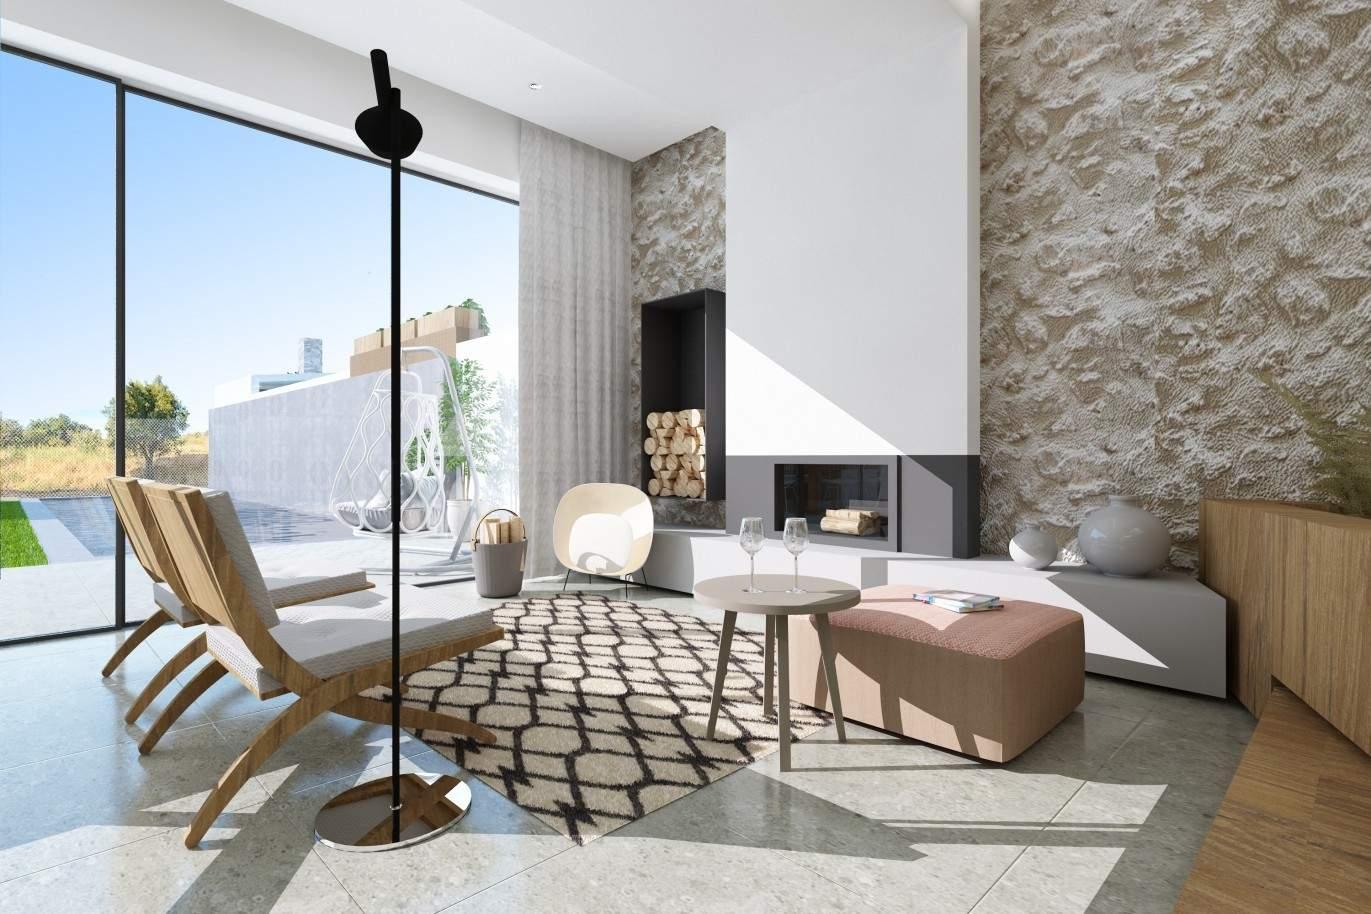 sale-of-new-modern-villa-in-boliqueime-loule-algarve-portugal